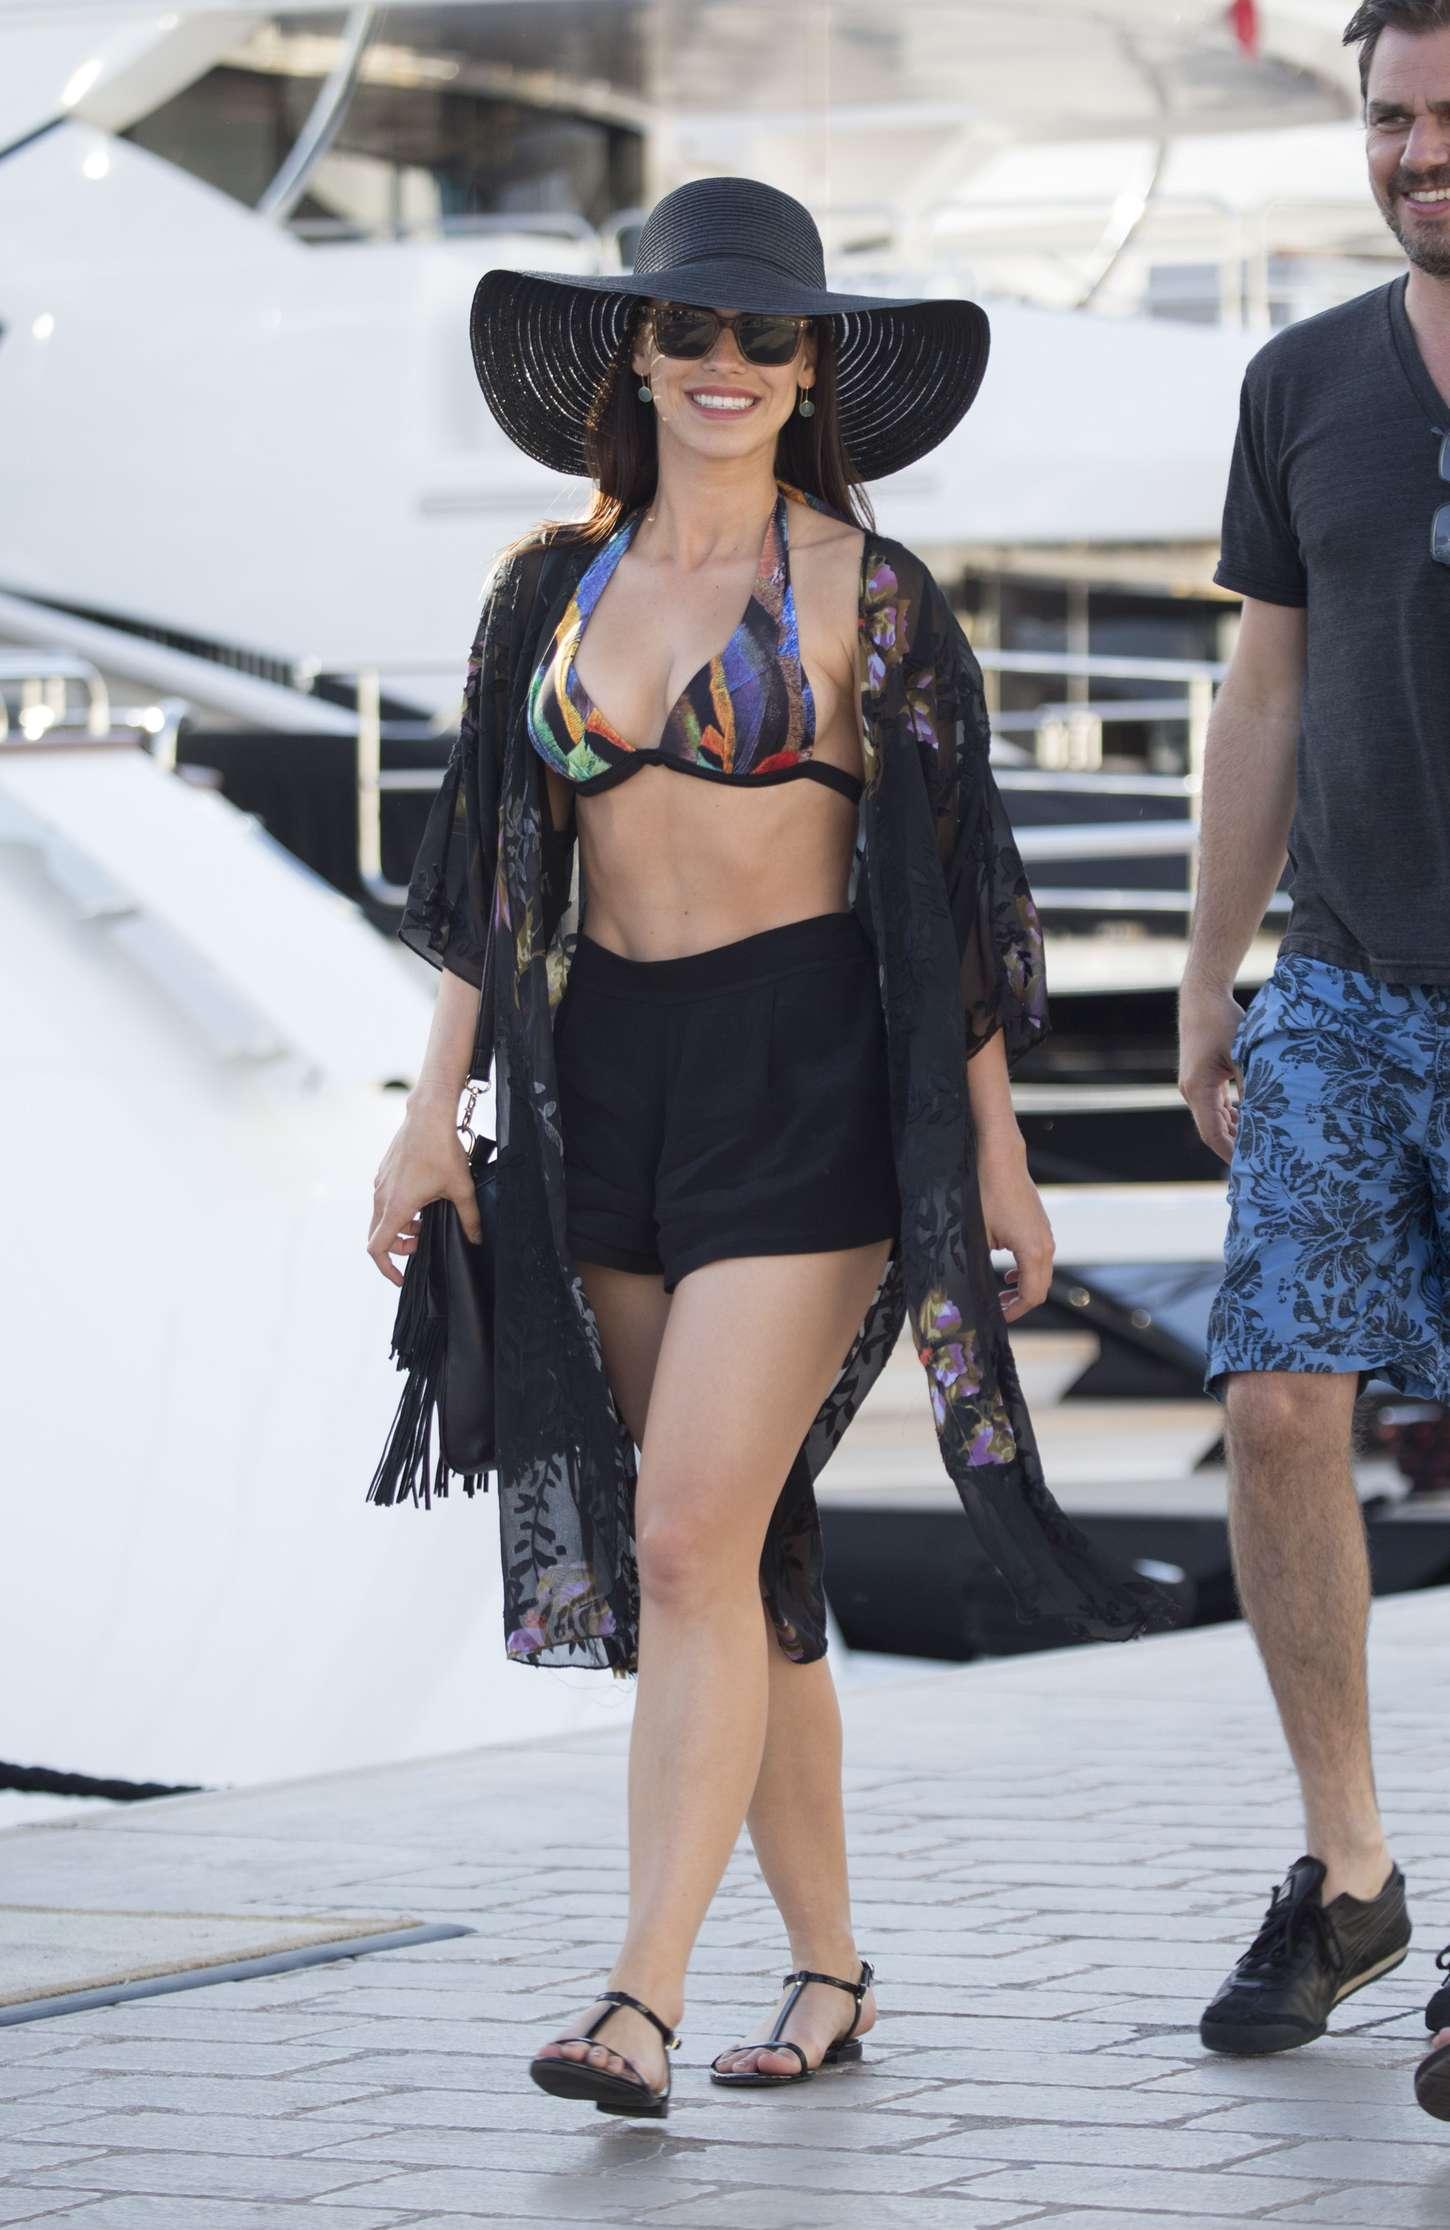 Jessica-Lowndes-in-Bikini-Top--06.jpg